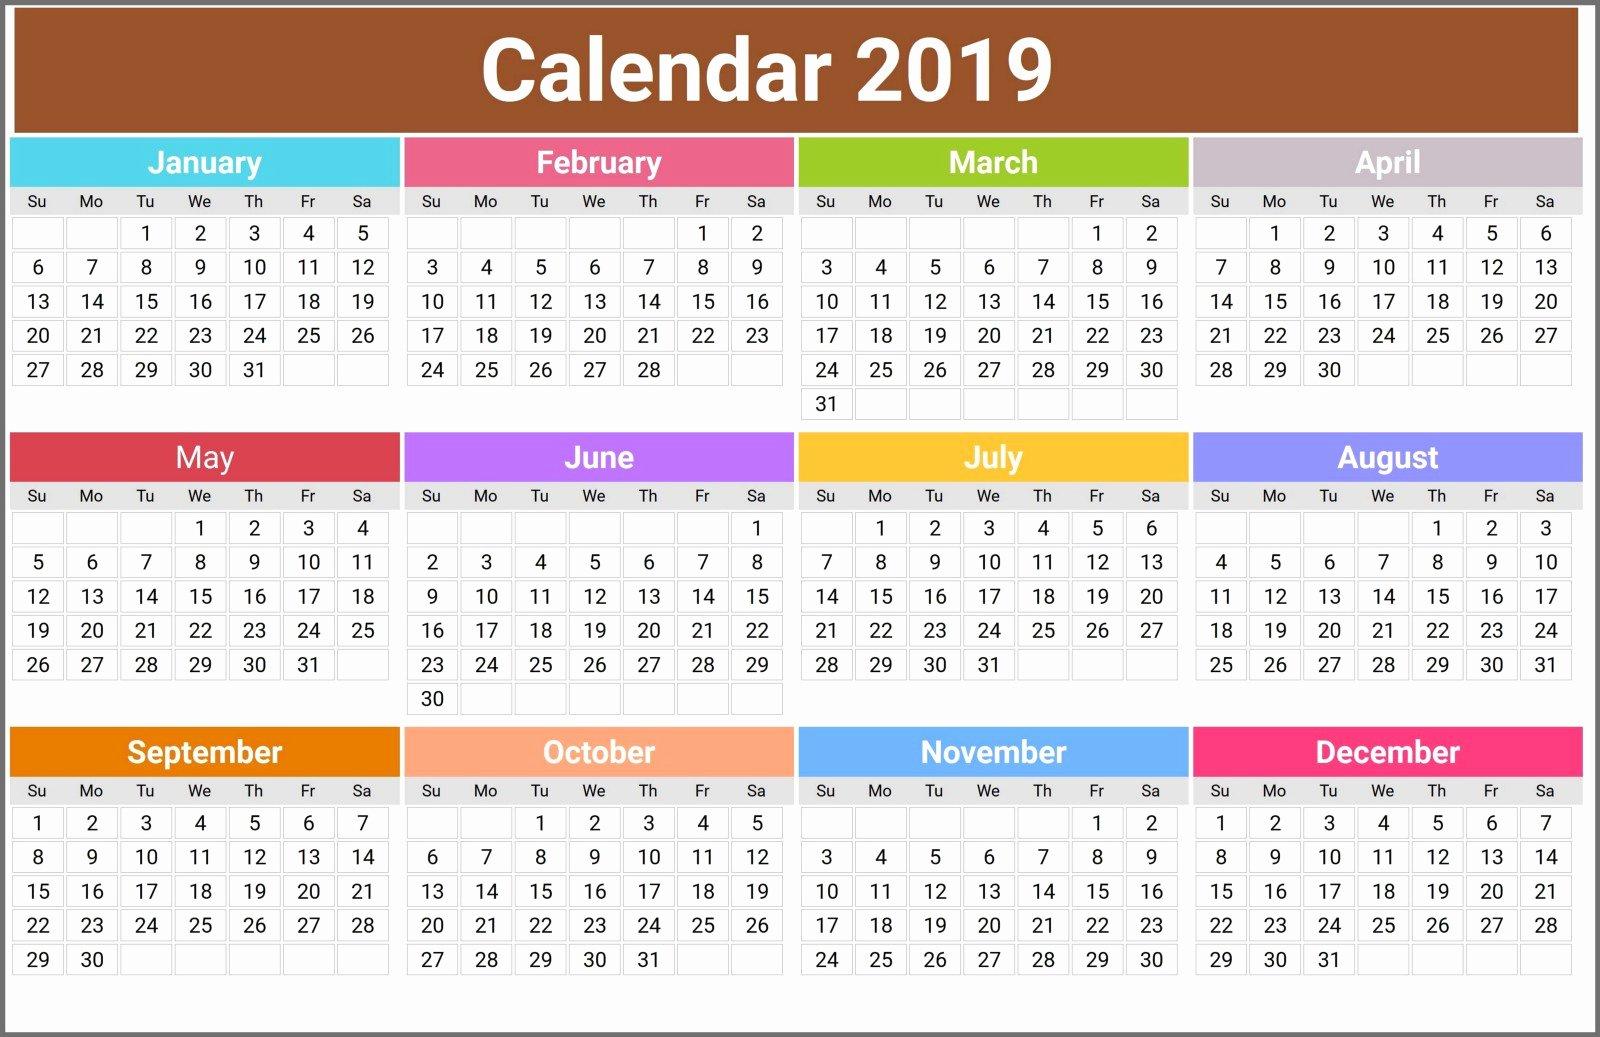 Hindu Calendar 2019 Usa Info Intended For Calendar 2019 Hindu Calendar Of 2019 With Hindu Festival